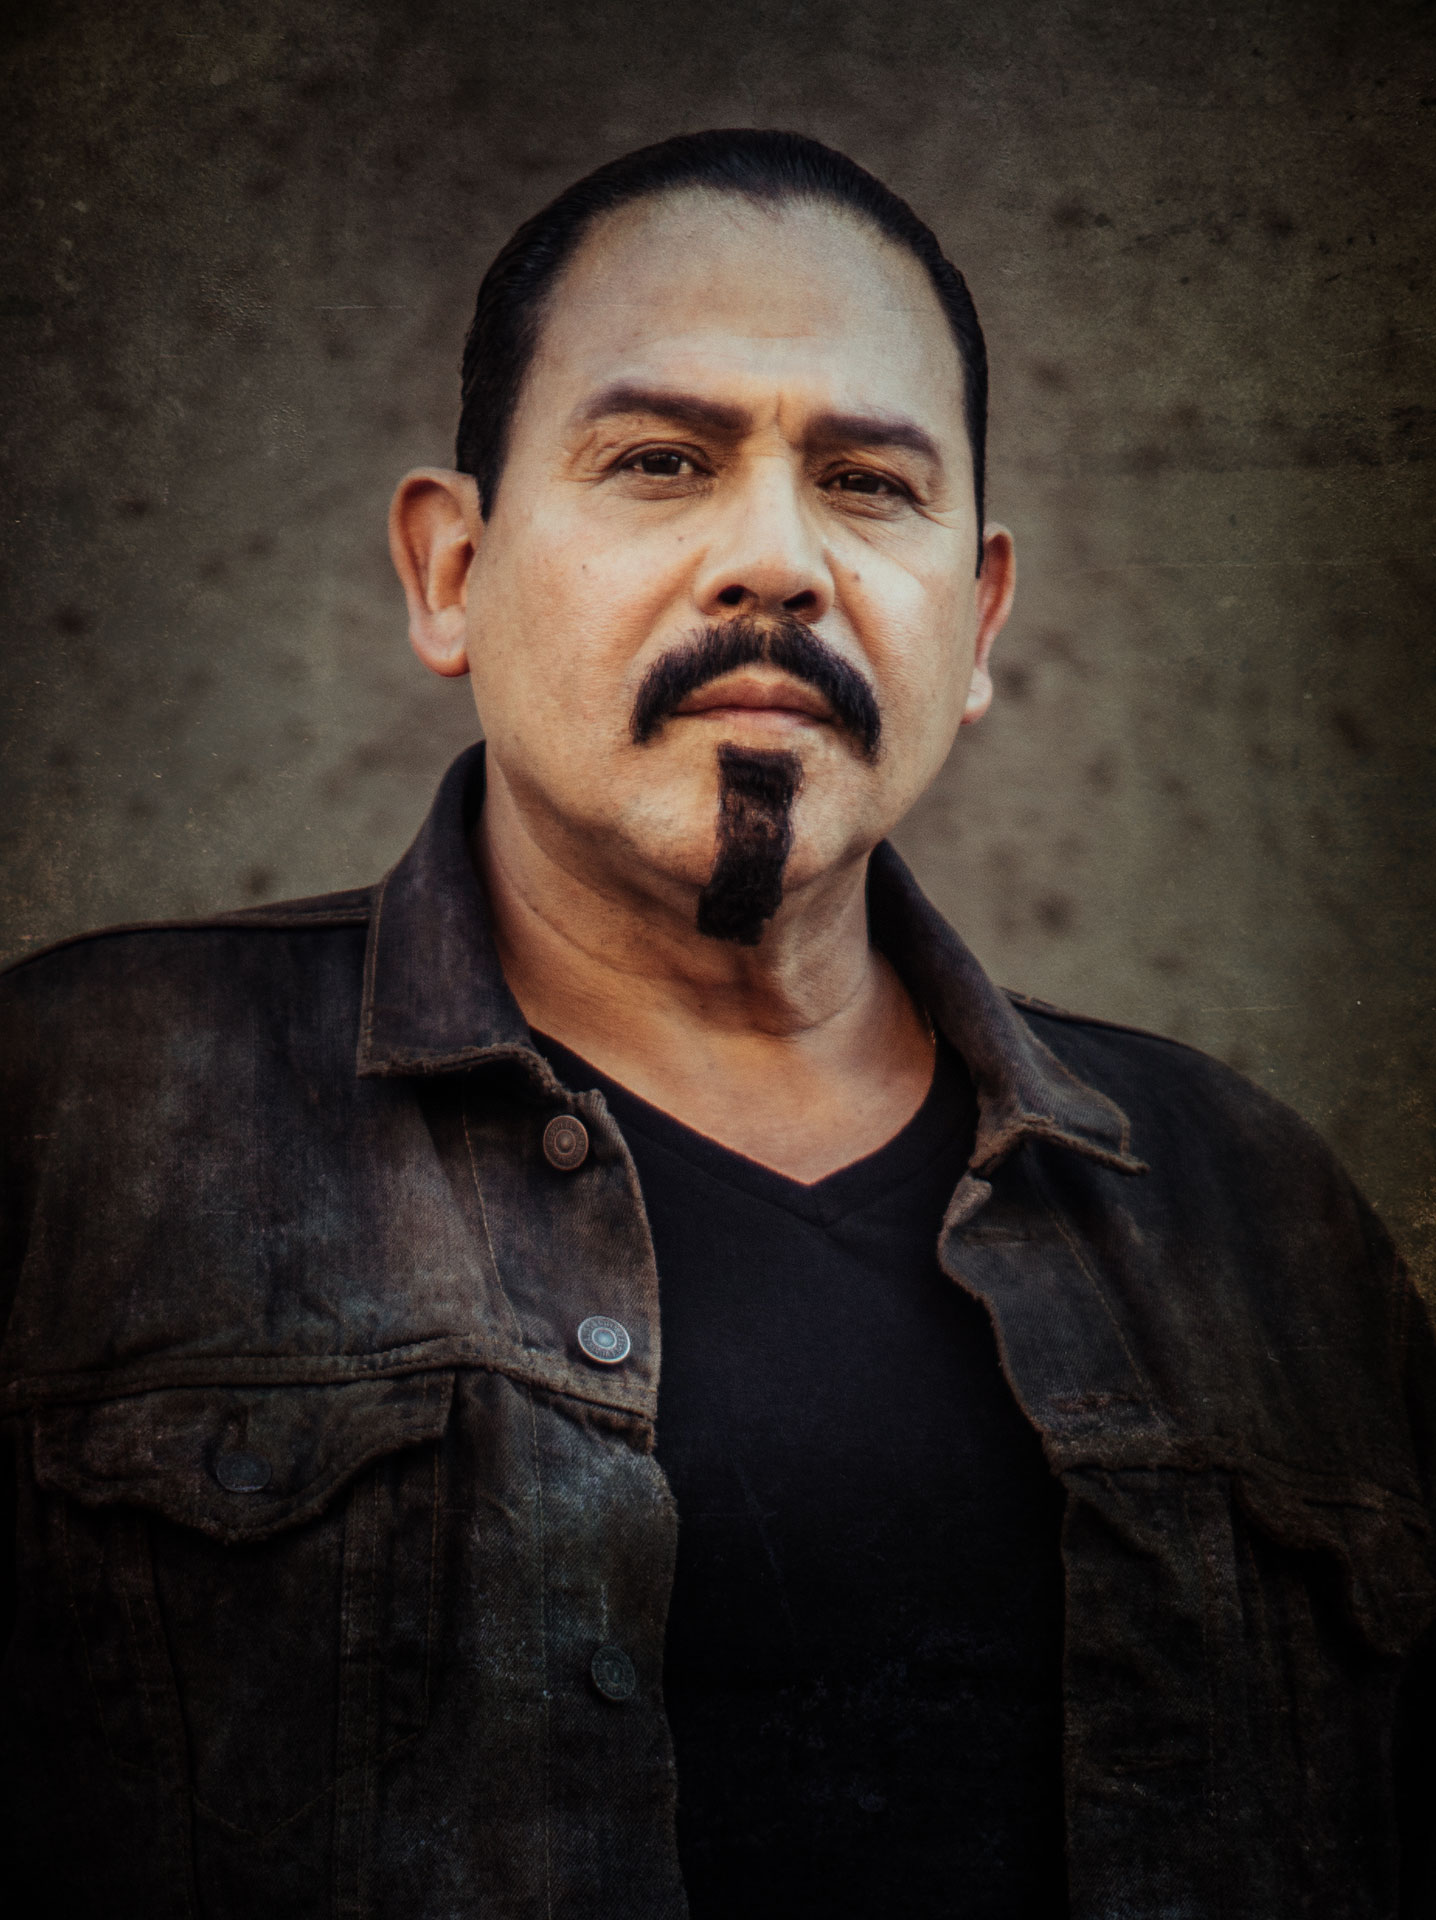 Anarchy Nation Pictures emilio rivera (hector alvarez) – cast | z nation | syfy